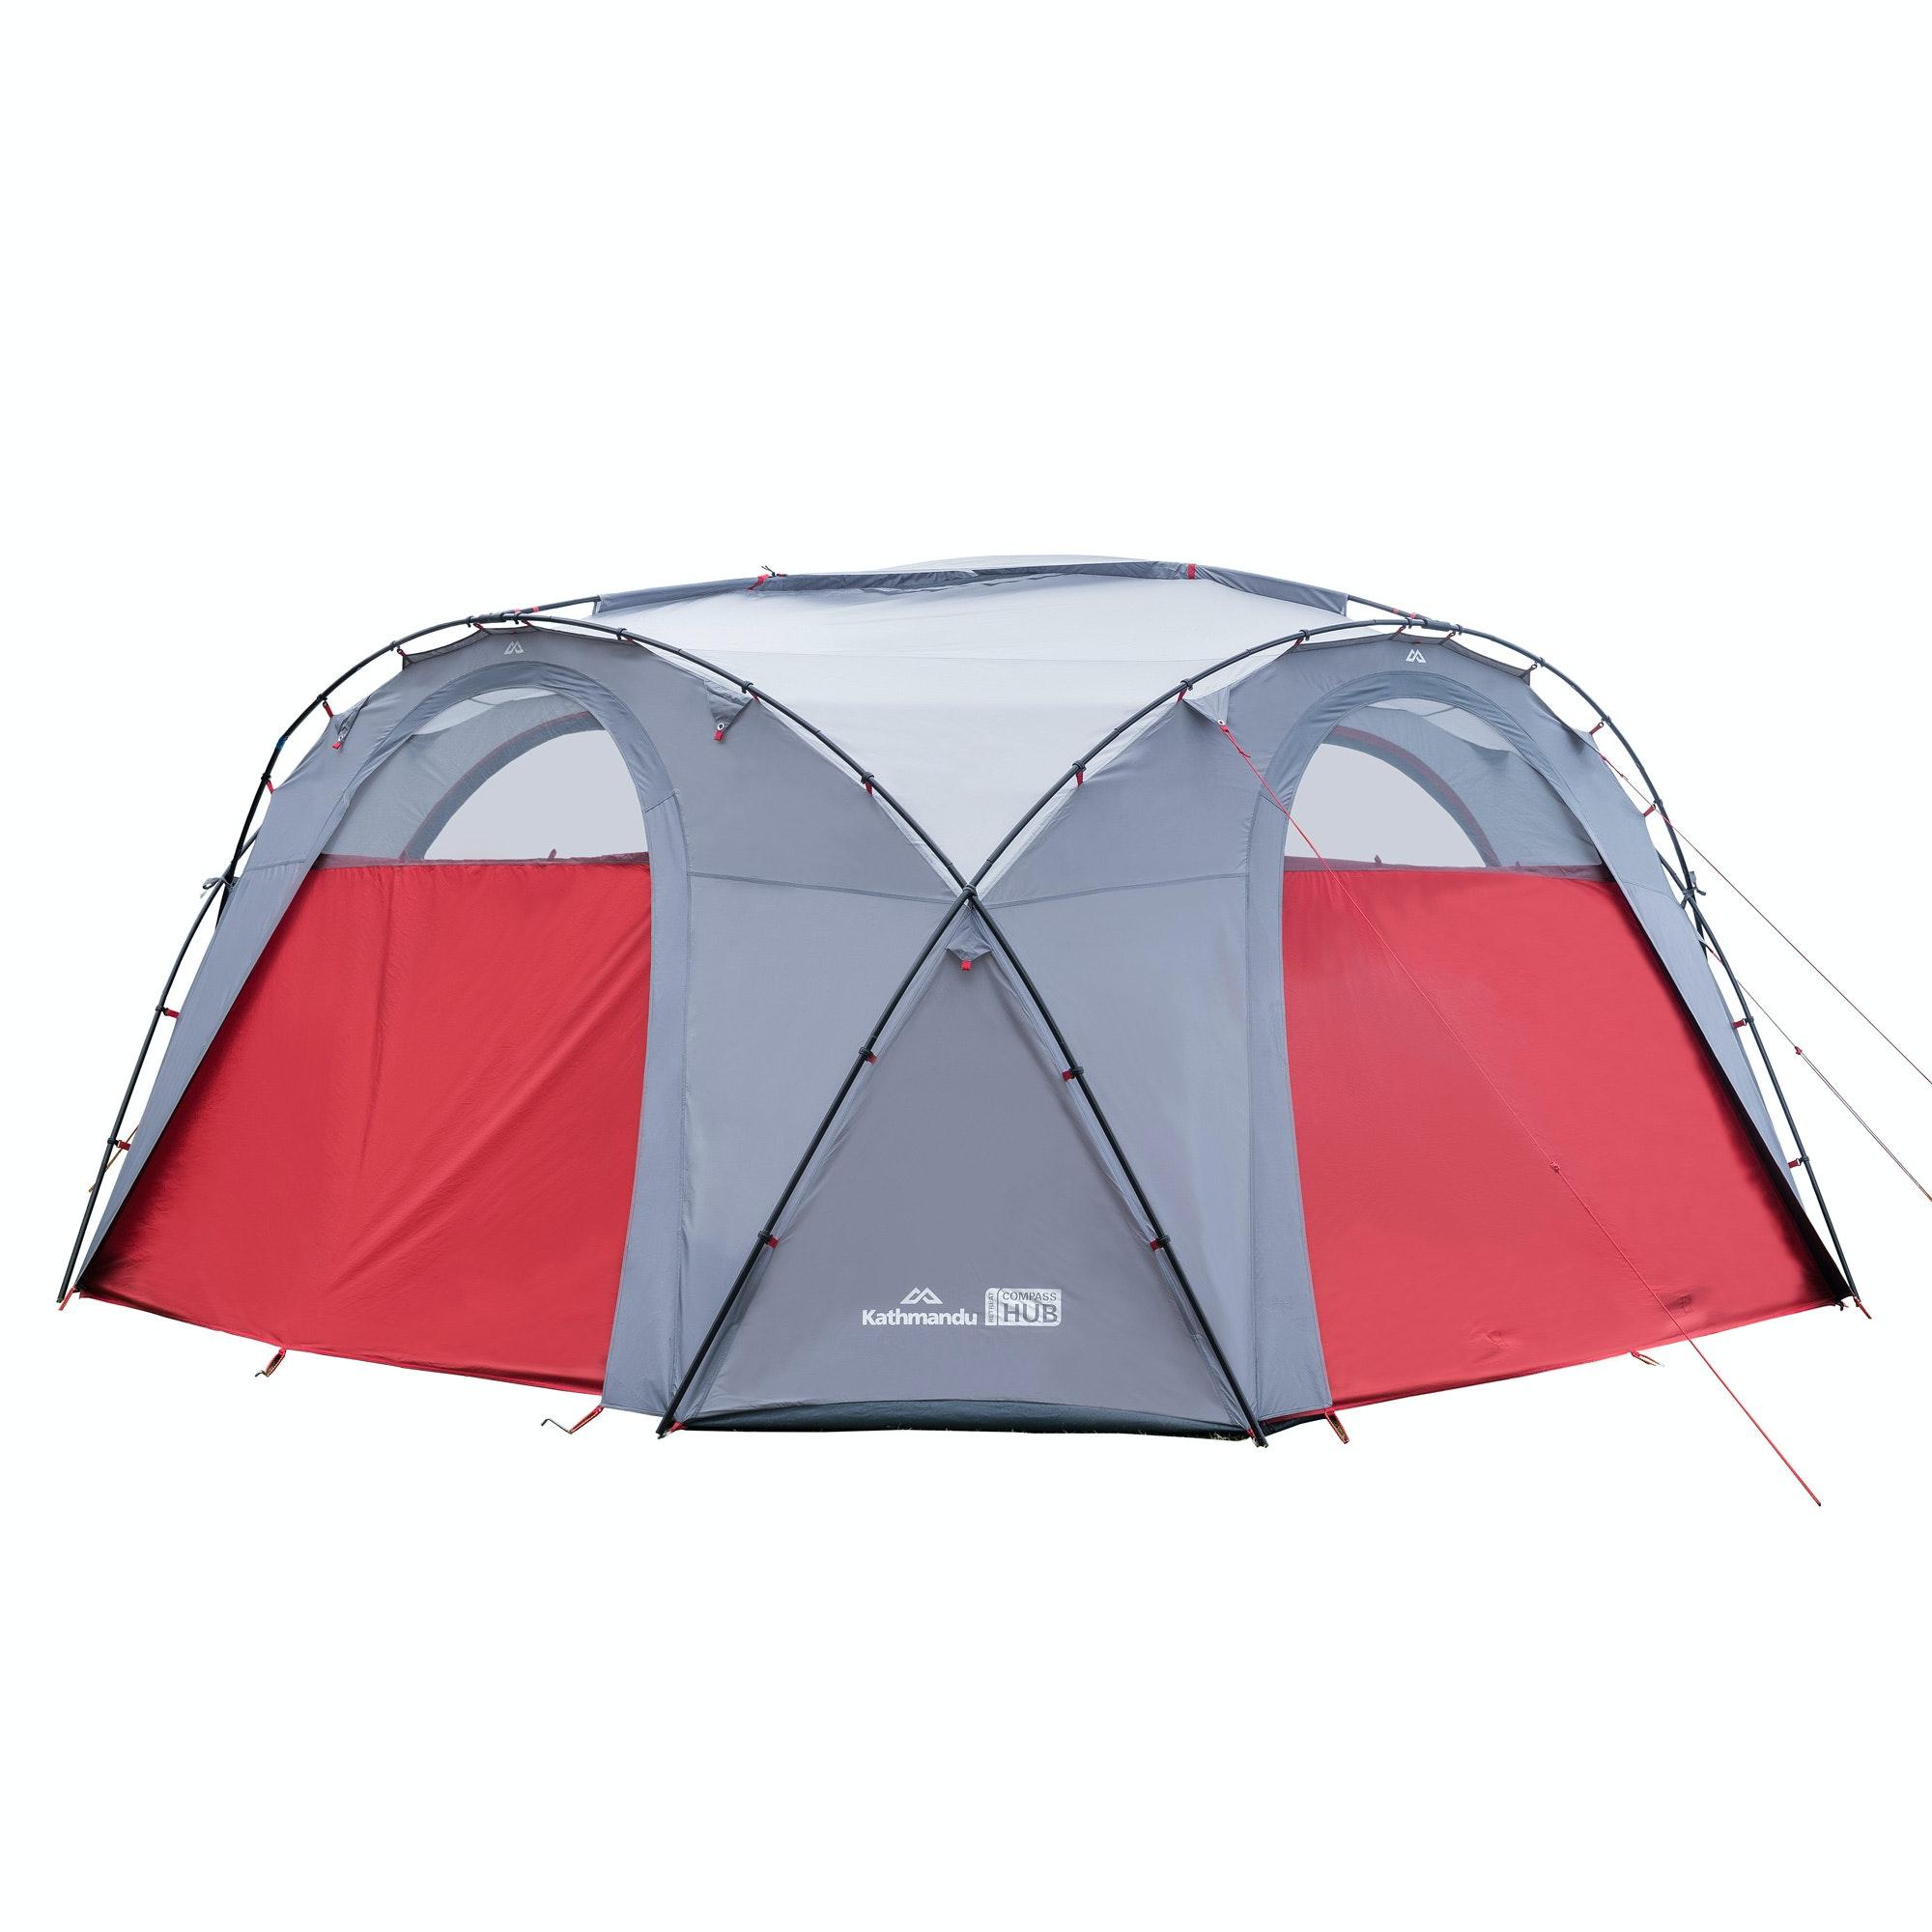 Retreat Compass Hub  sc 1 st  Kathmandu & Tents for Sale | 23456 u0026 7 Person Tent | Kathmandu Australia